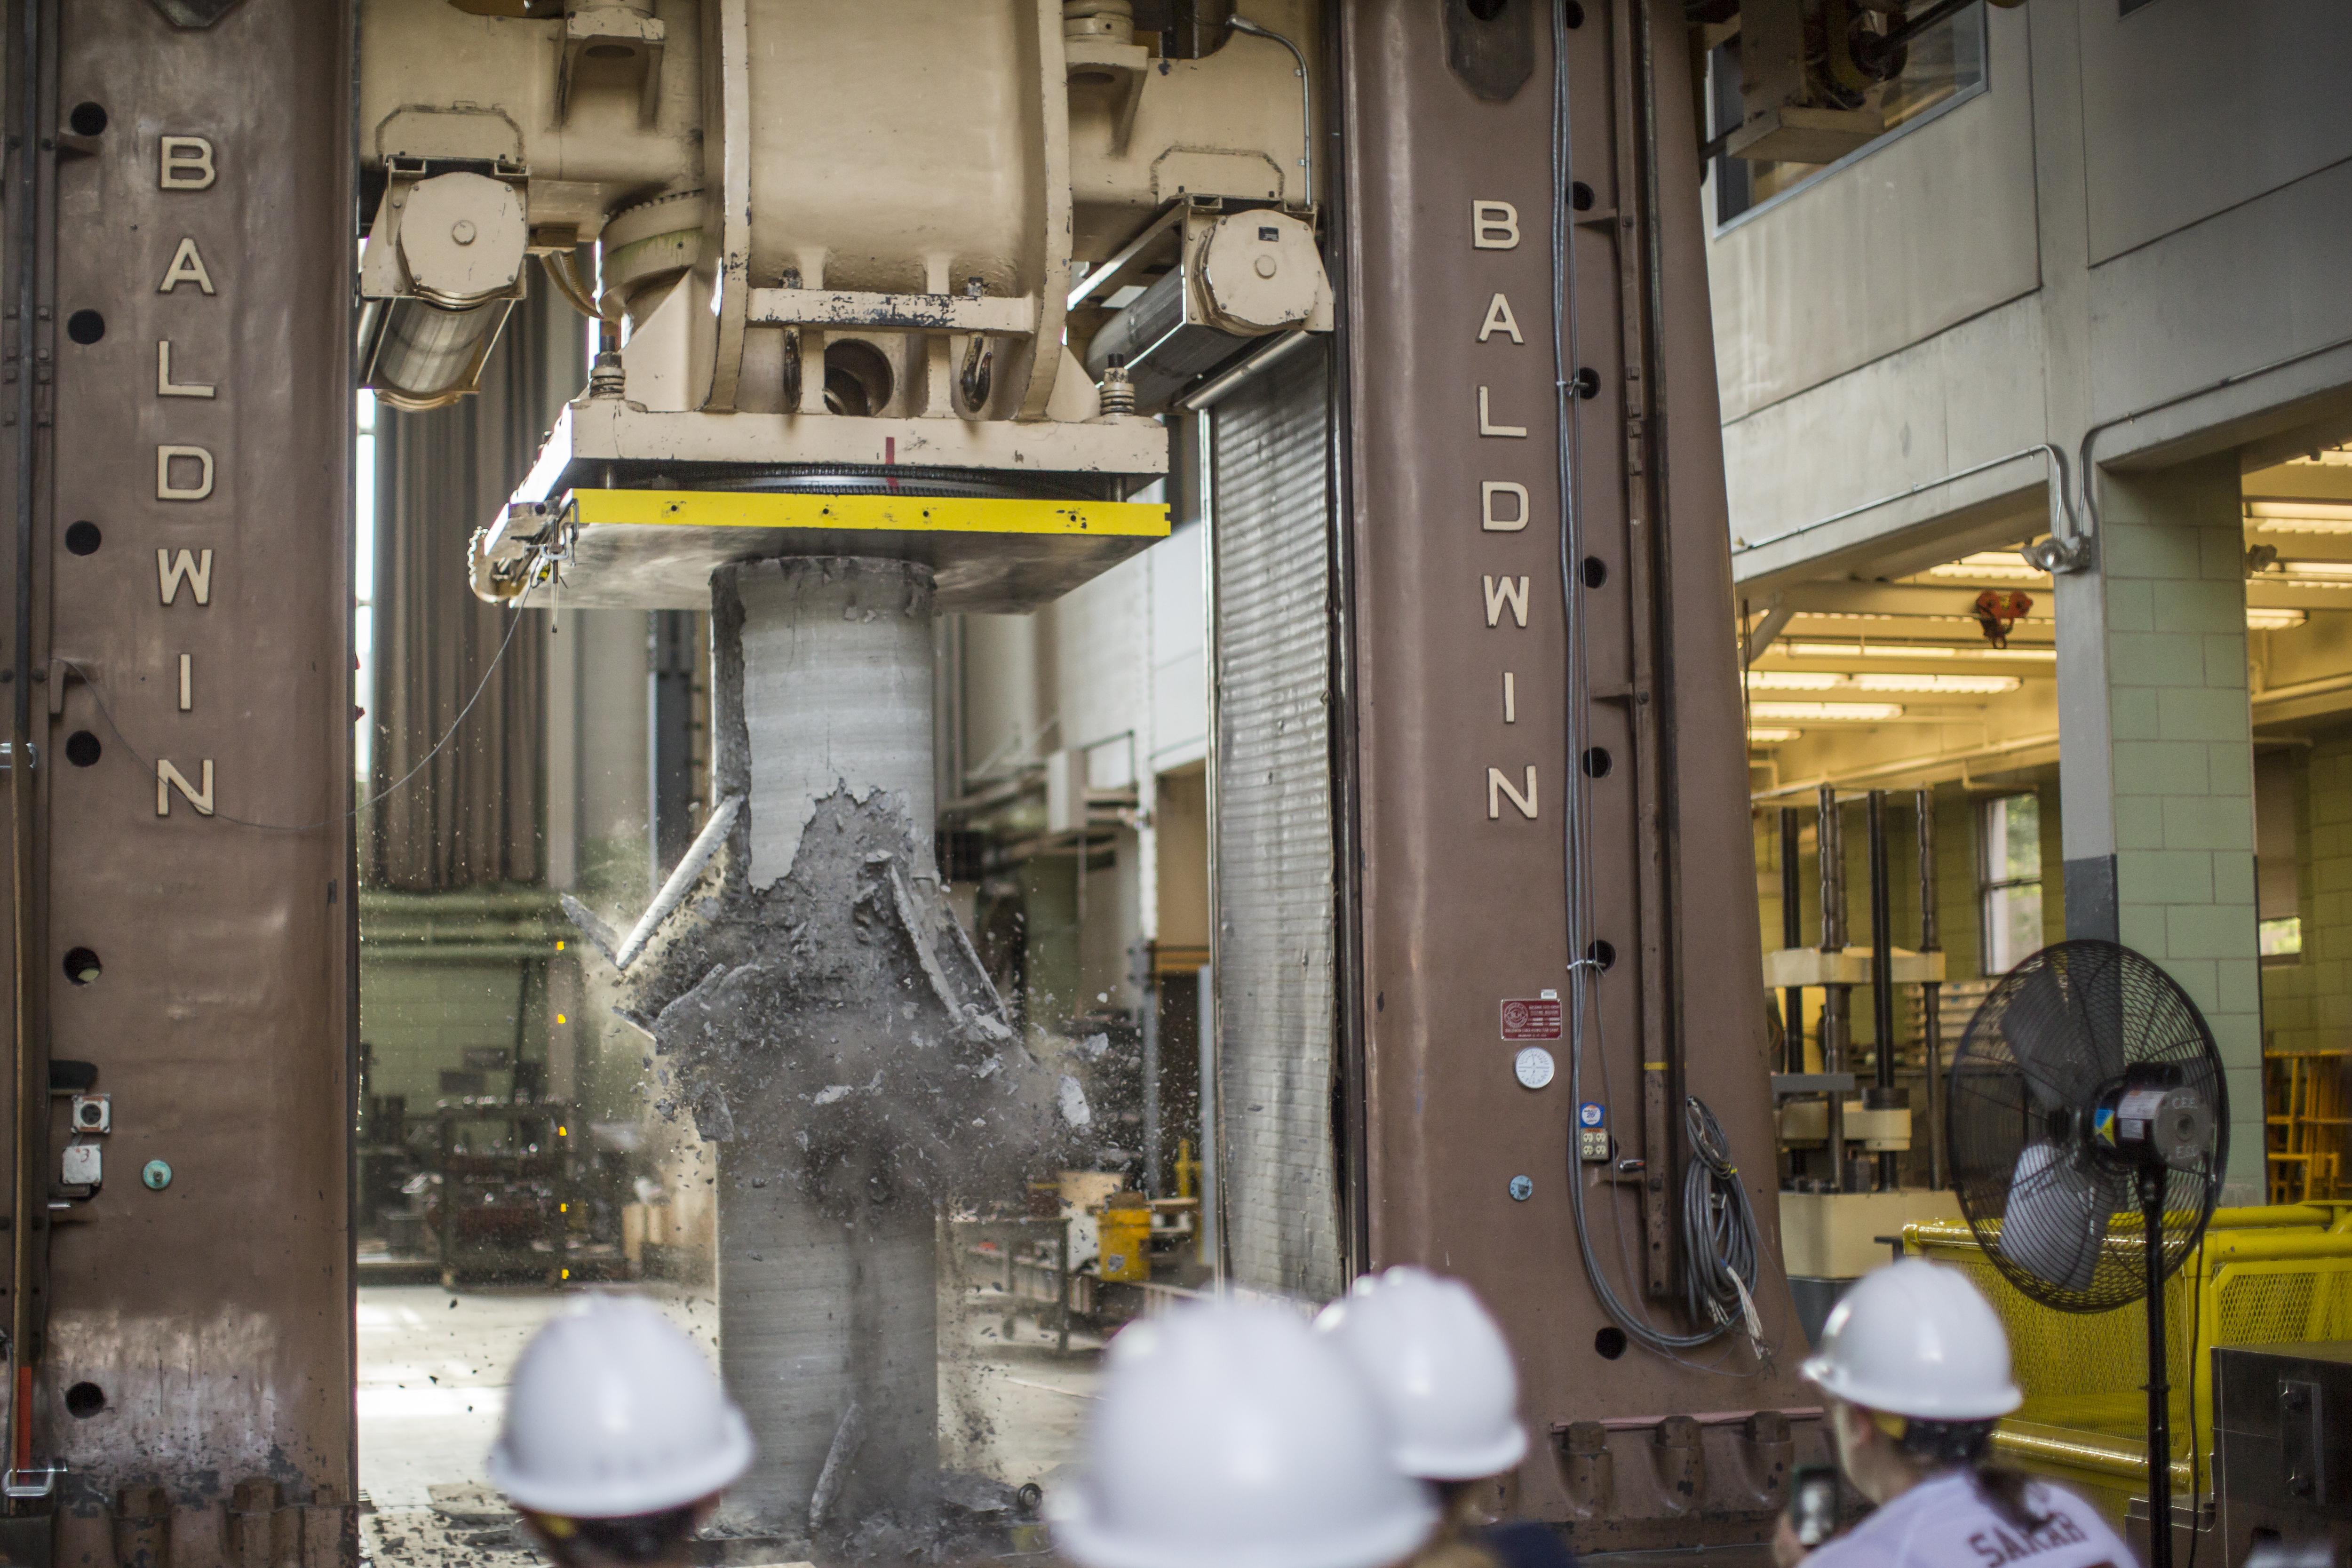 testing machine in fritz lab testing a pillar for breakage. shattered pillar